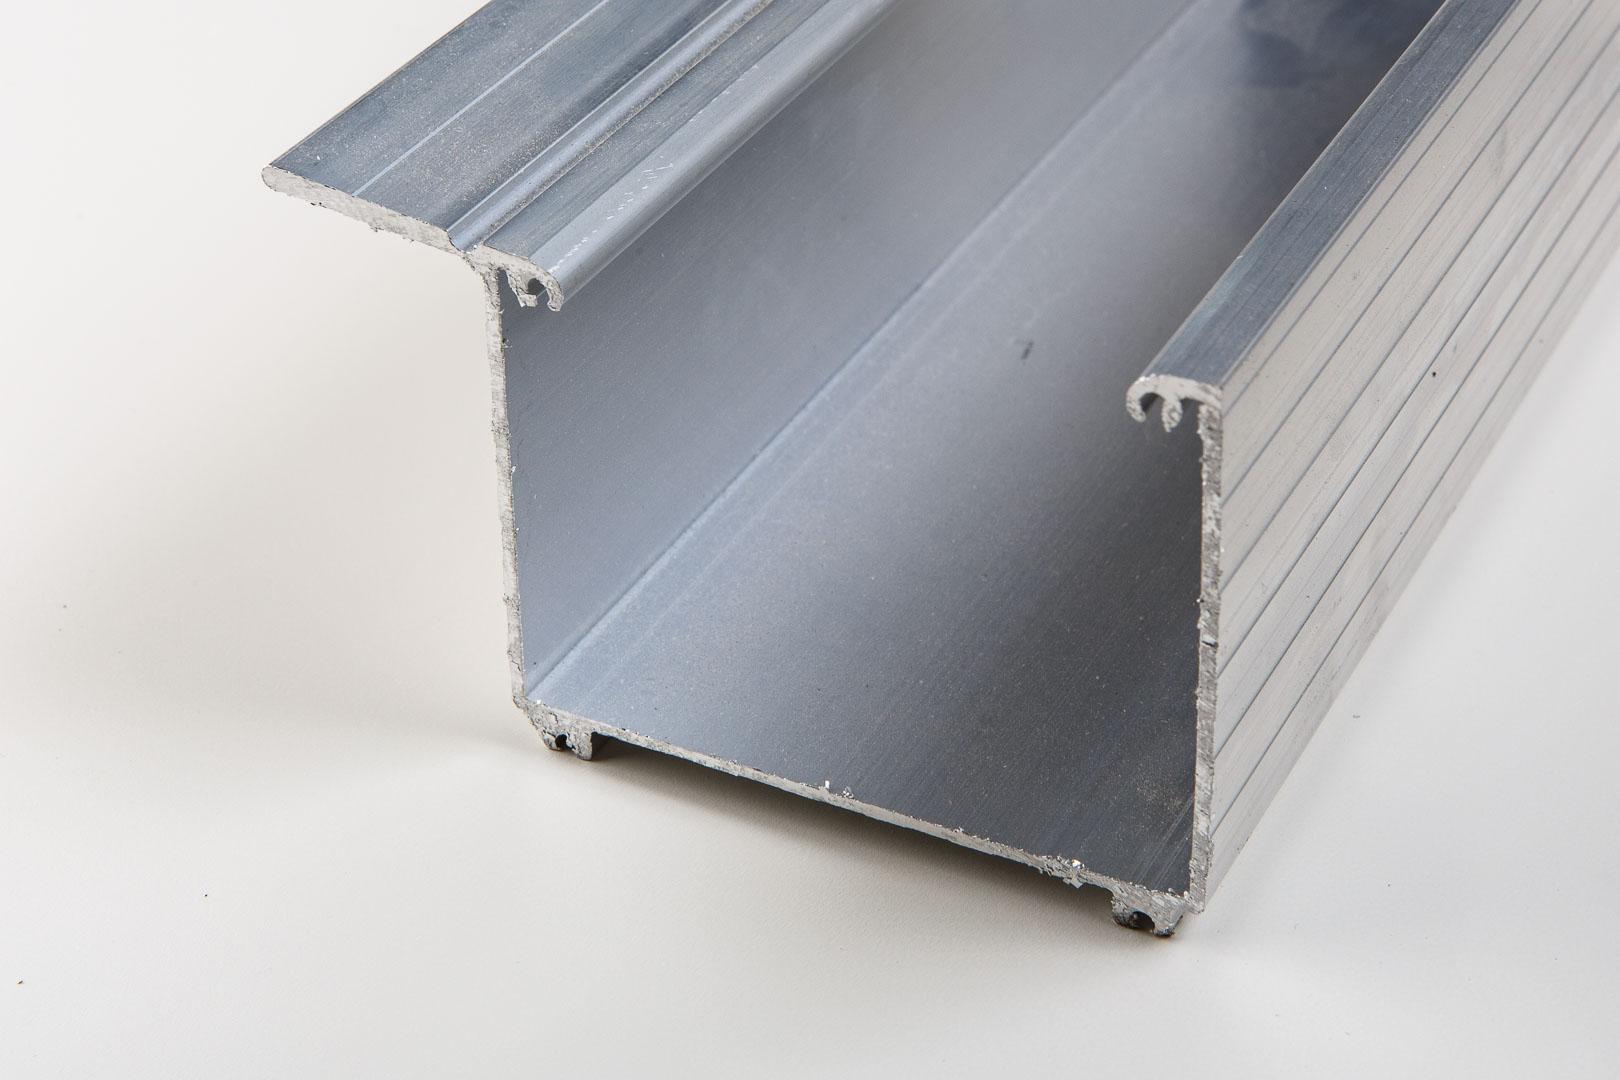 Aluminium Kastenrinne pressblank inkl. Zubehör